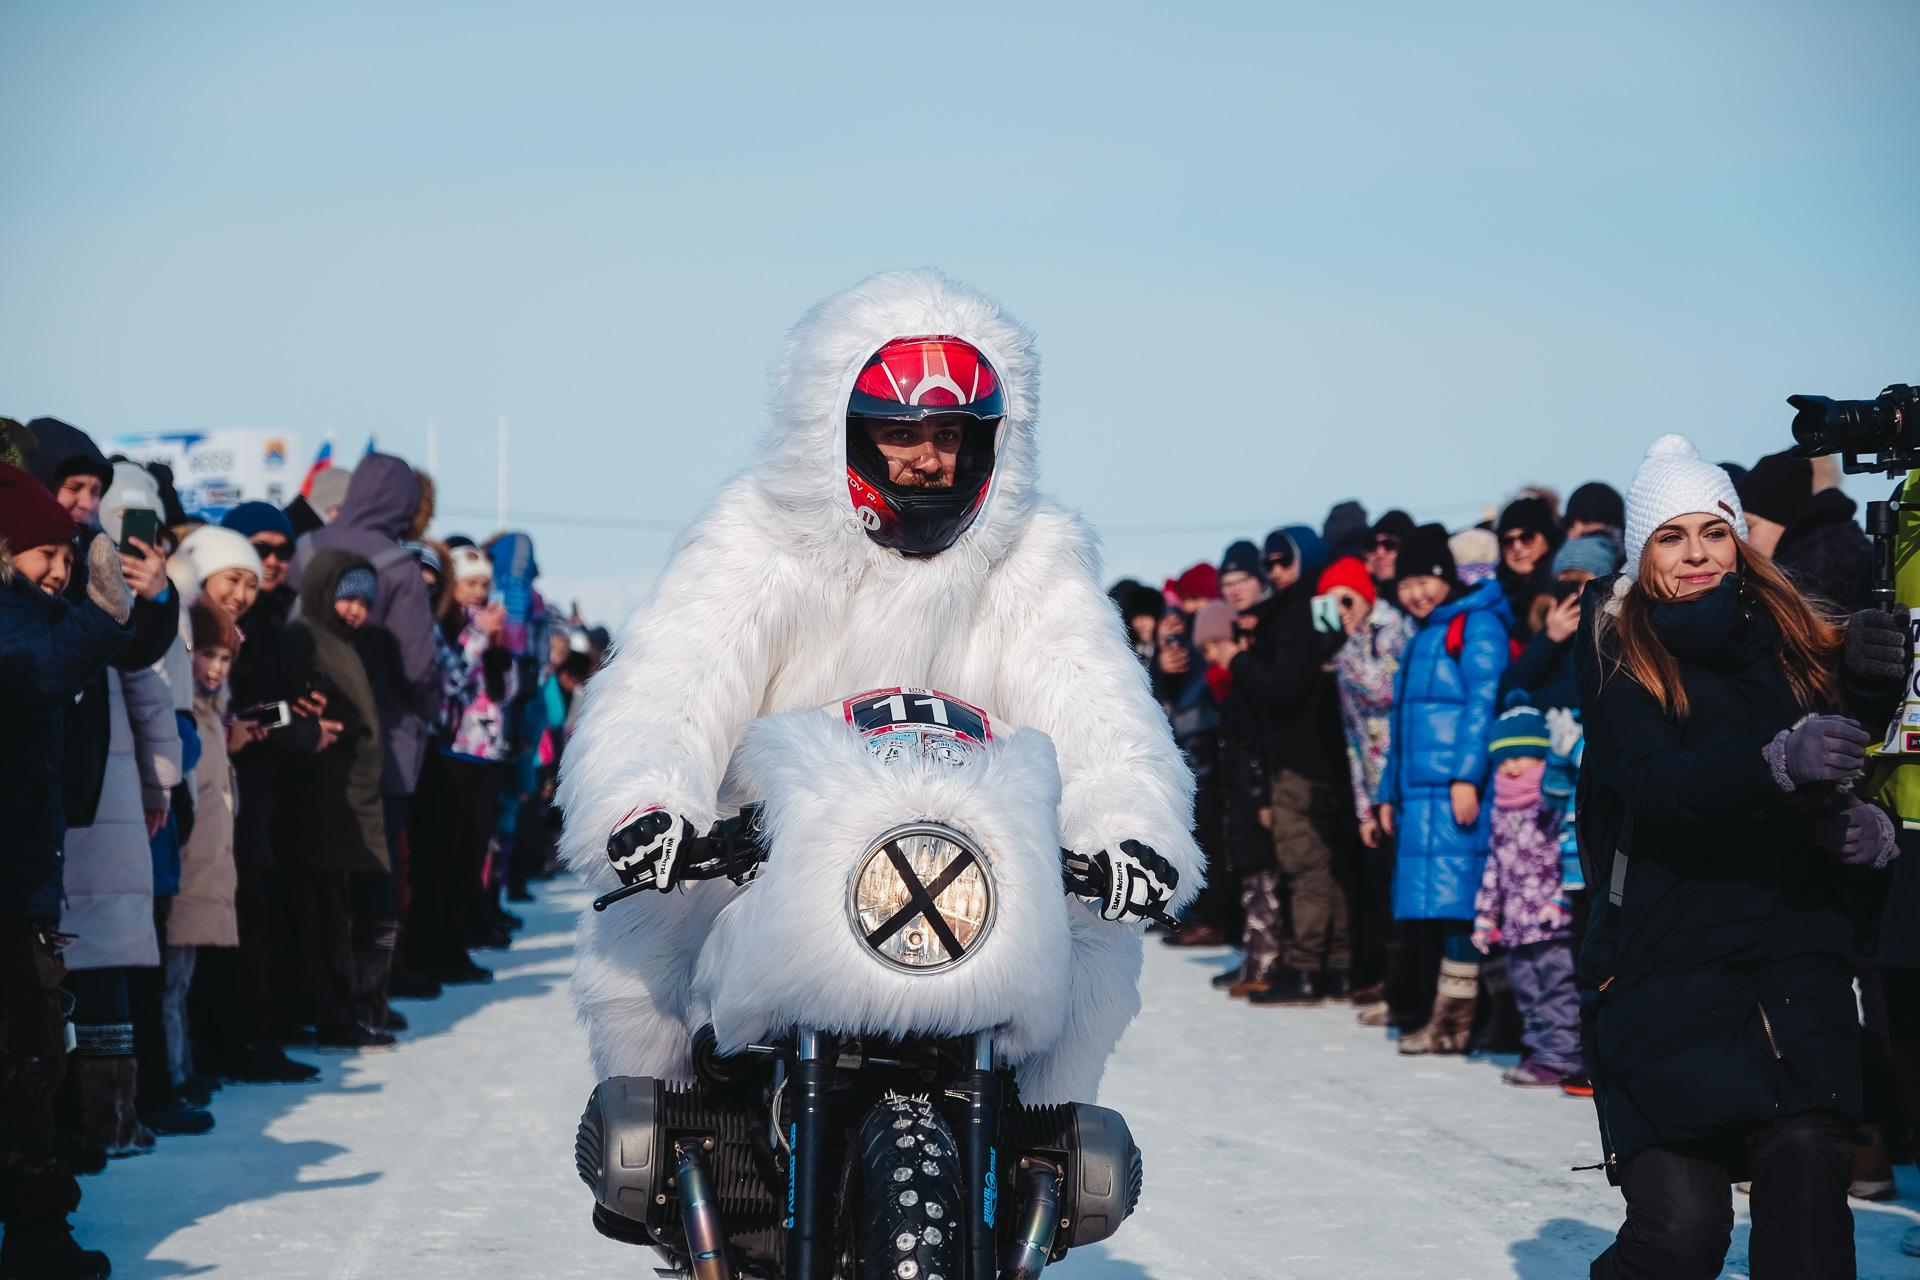 Байкальская Миля 2020 - Солдатов Роман Дмитриевич BMW R Ninet 2018 BMW ICE TEAM